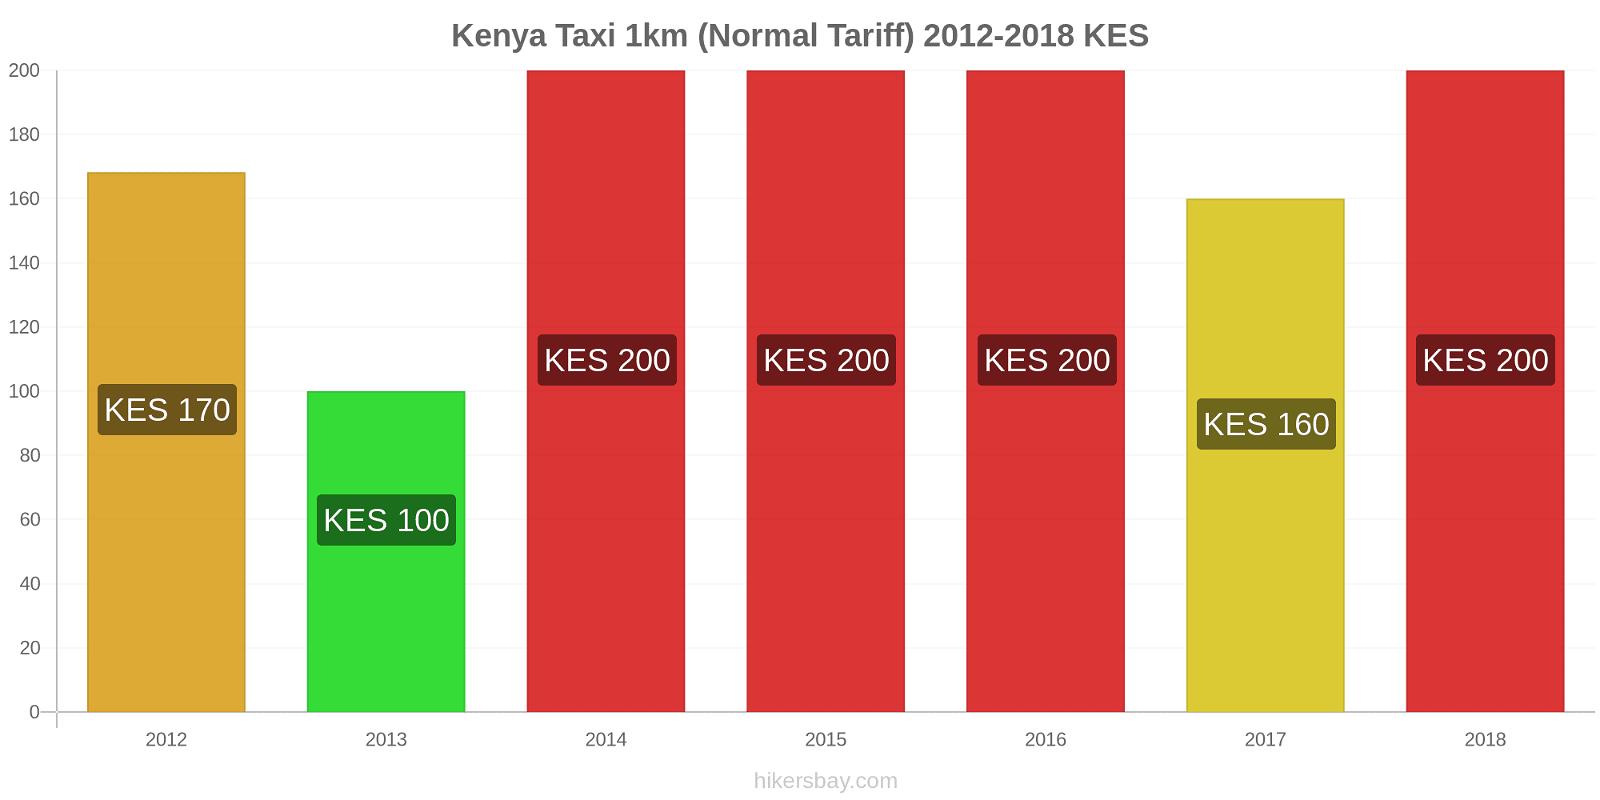 Kenya price changes Taxi 1km (Normal Tariff) hikersbay.com